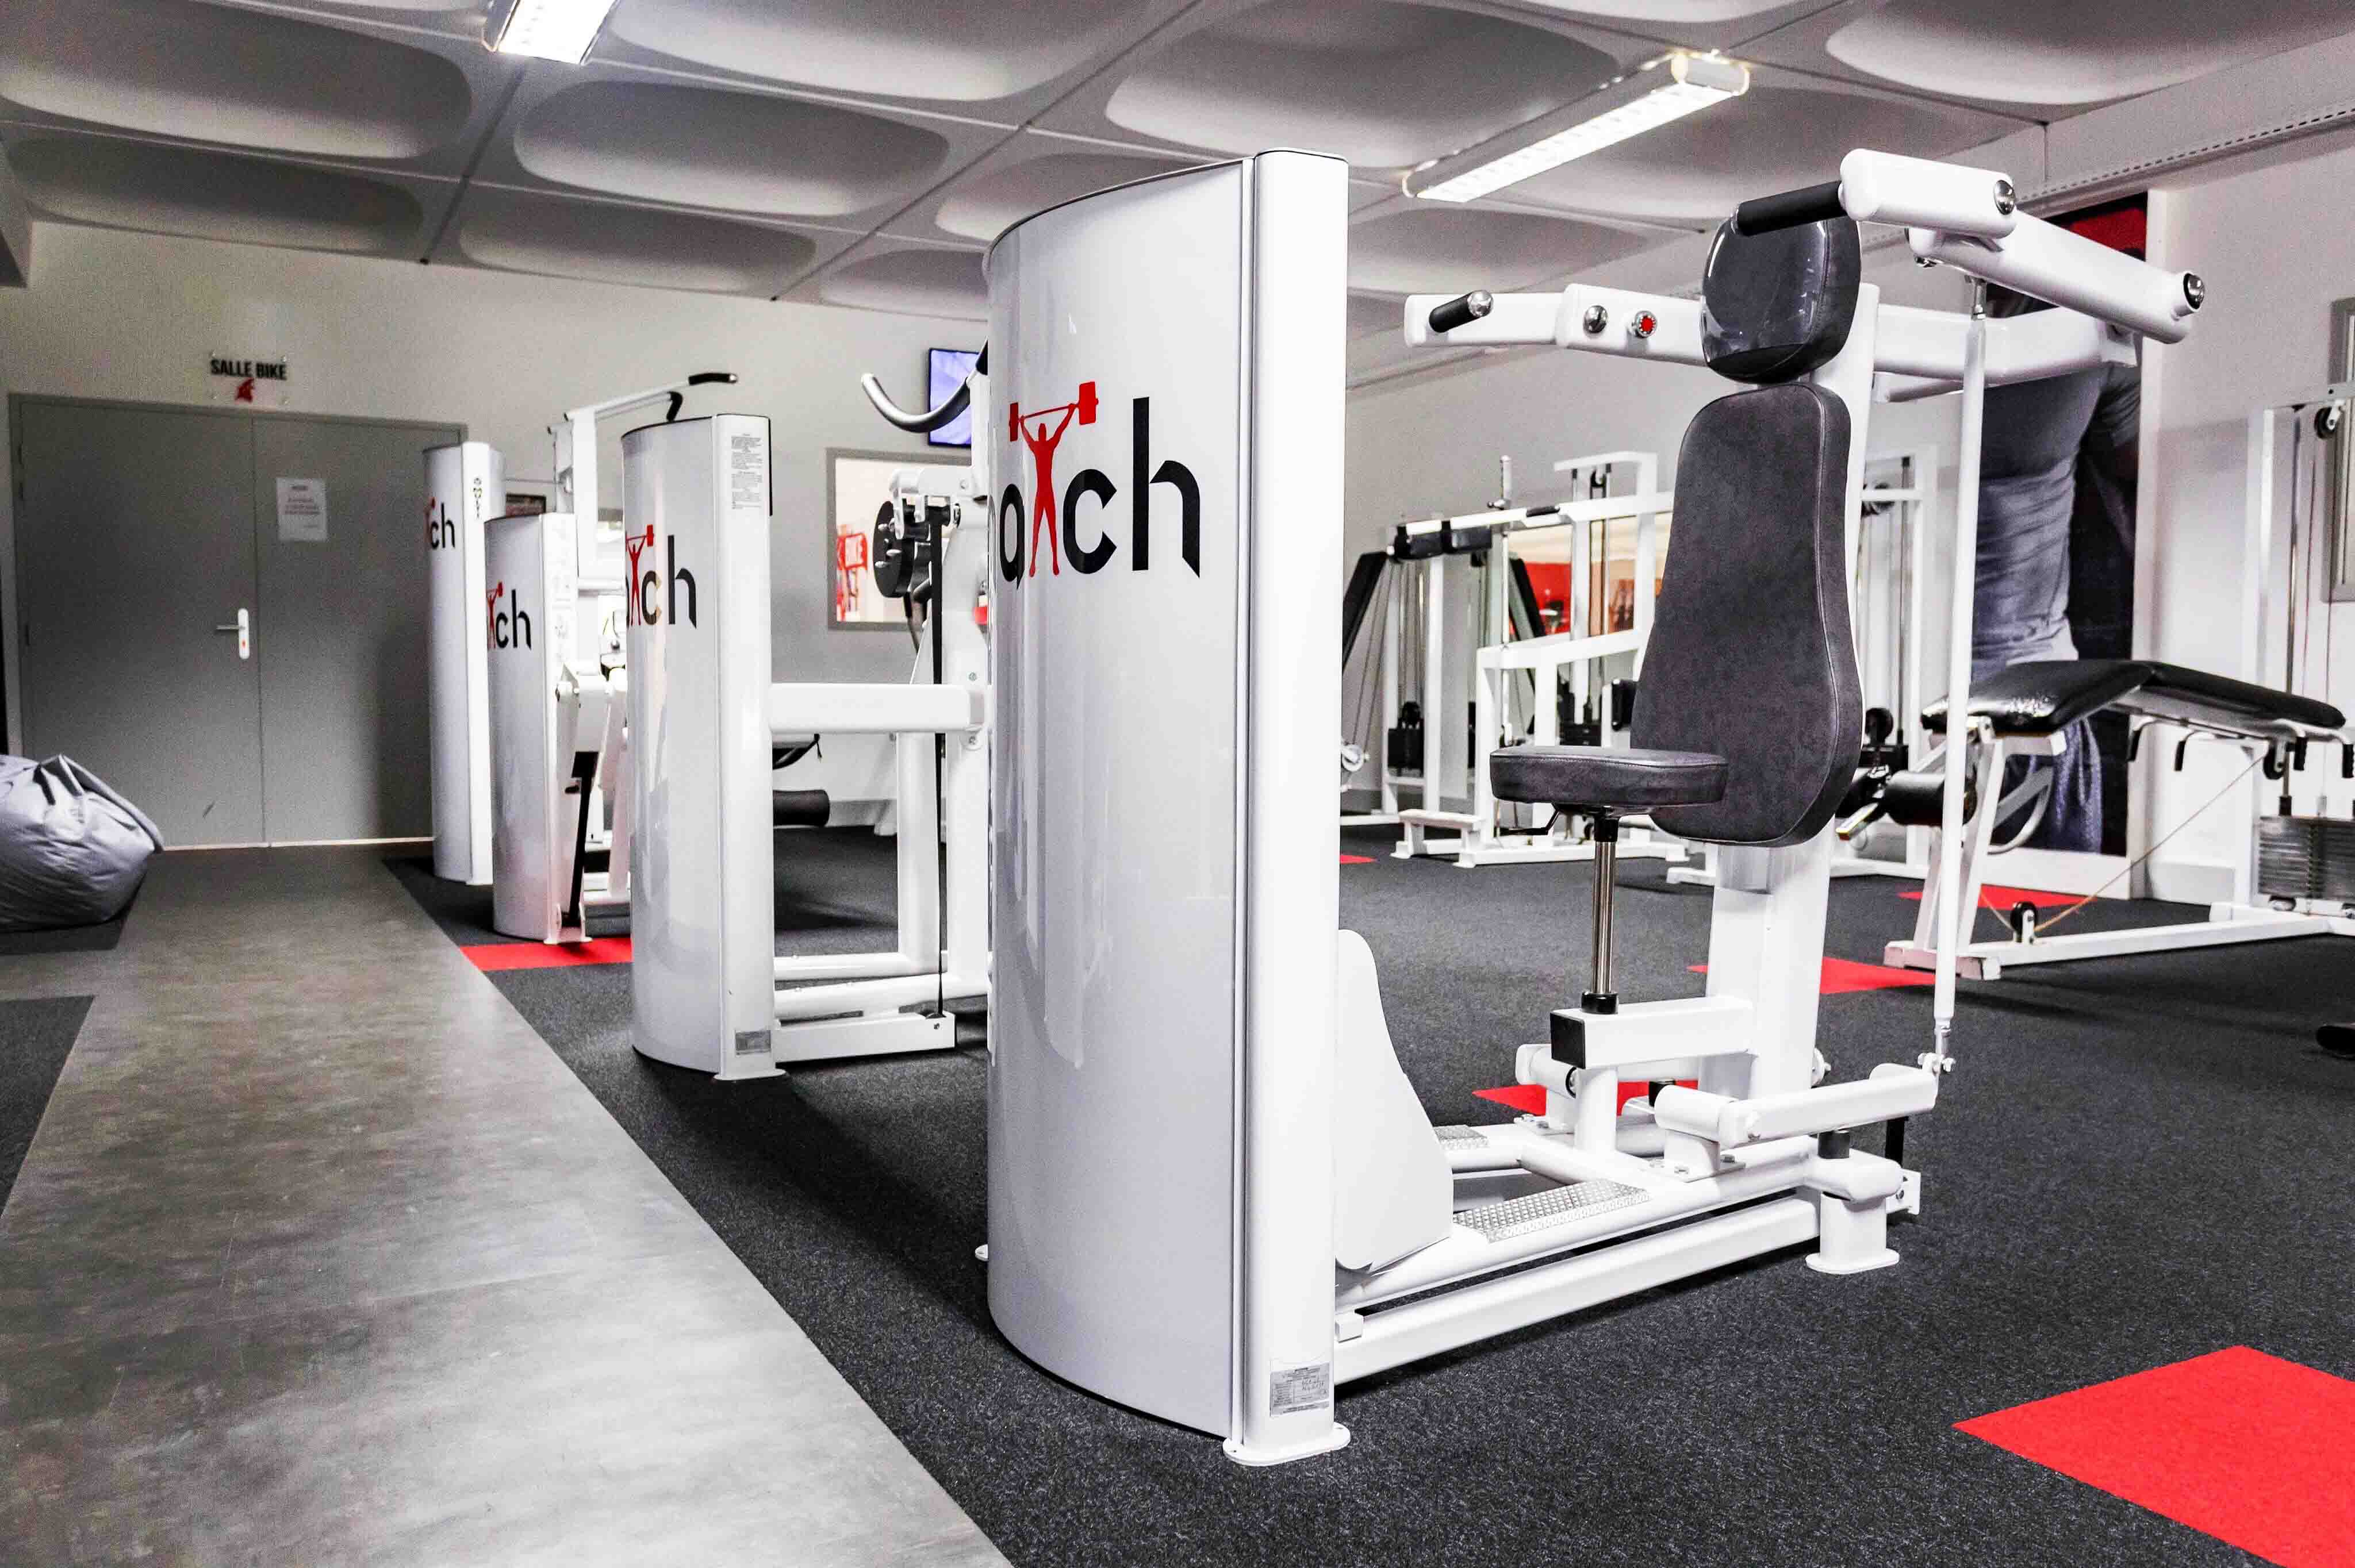 Snatch Fitness Club Besancon 101 Rue De Vesoul